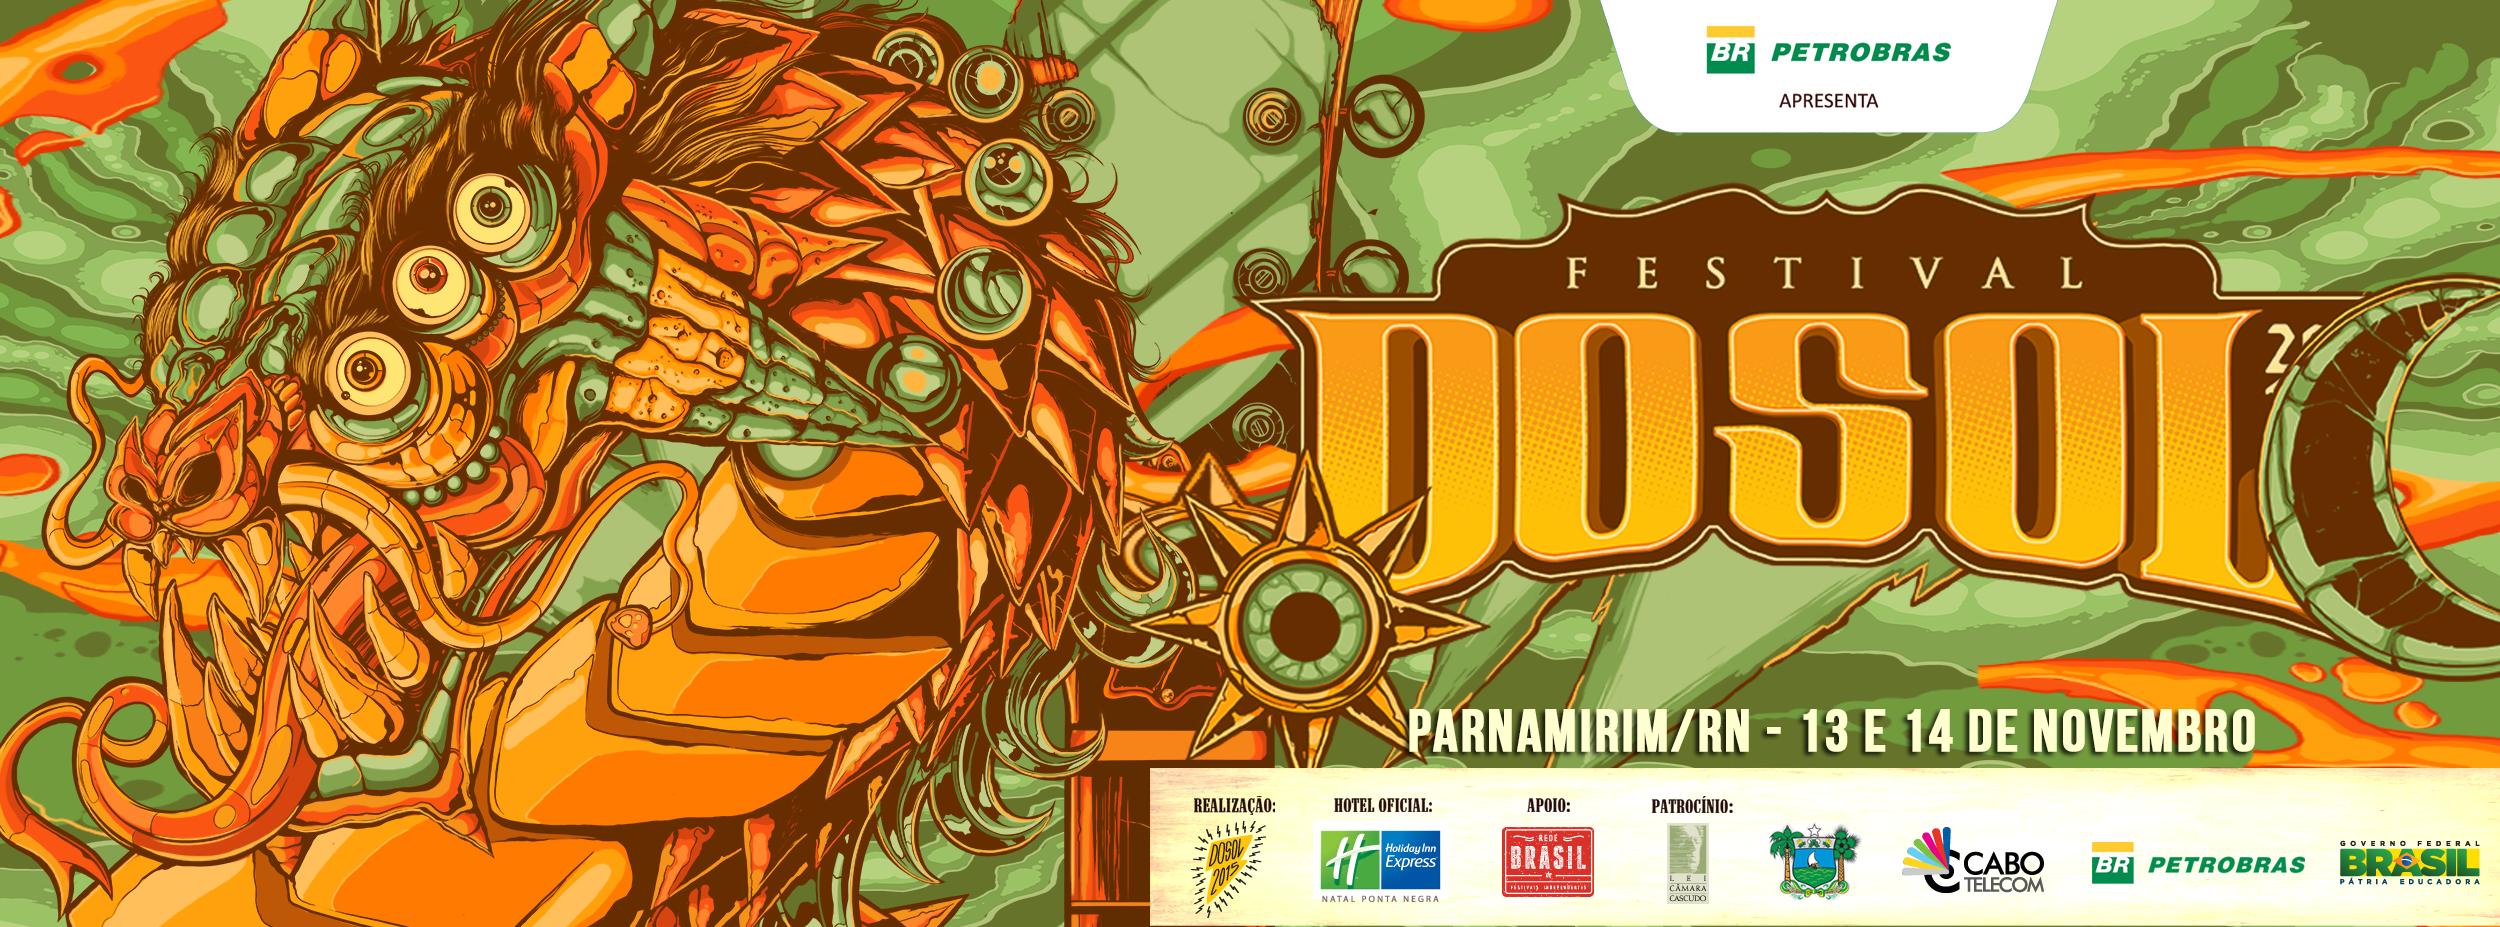 Festival DoSol 2015 – Parnamirim/RN